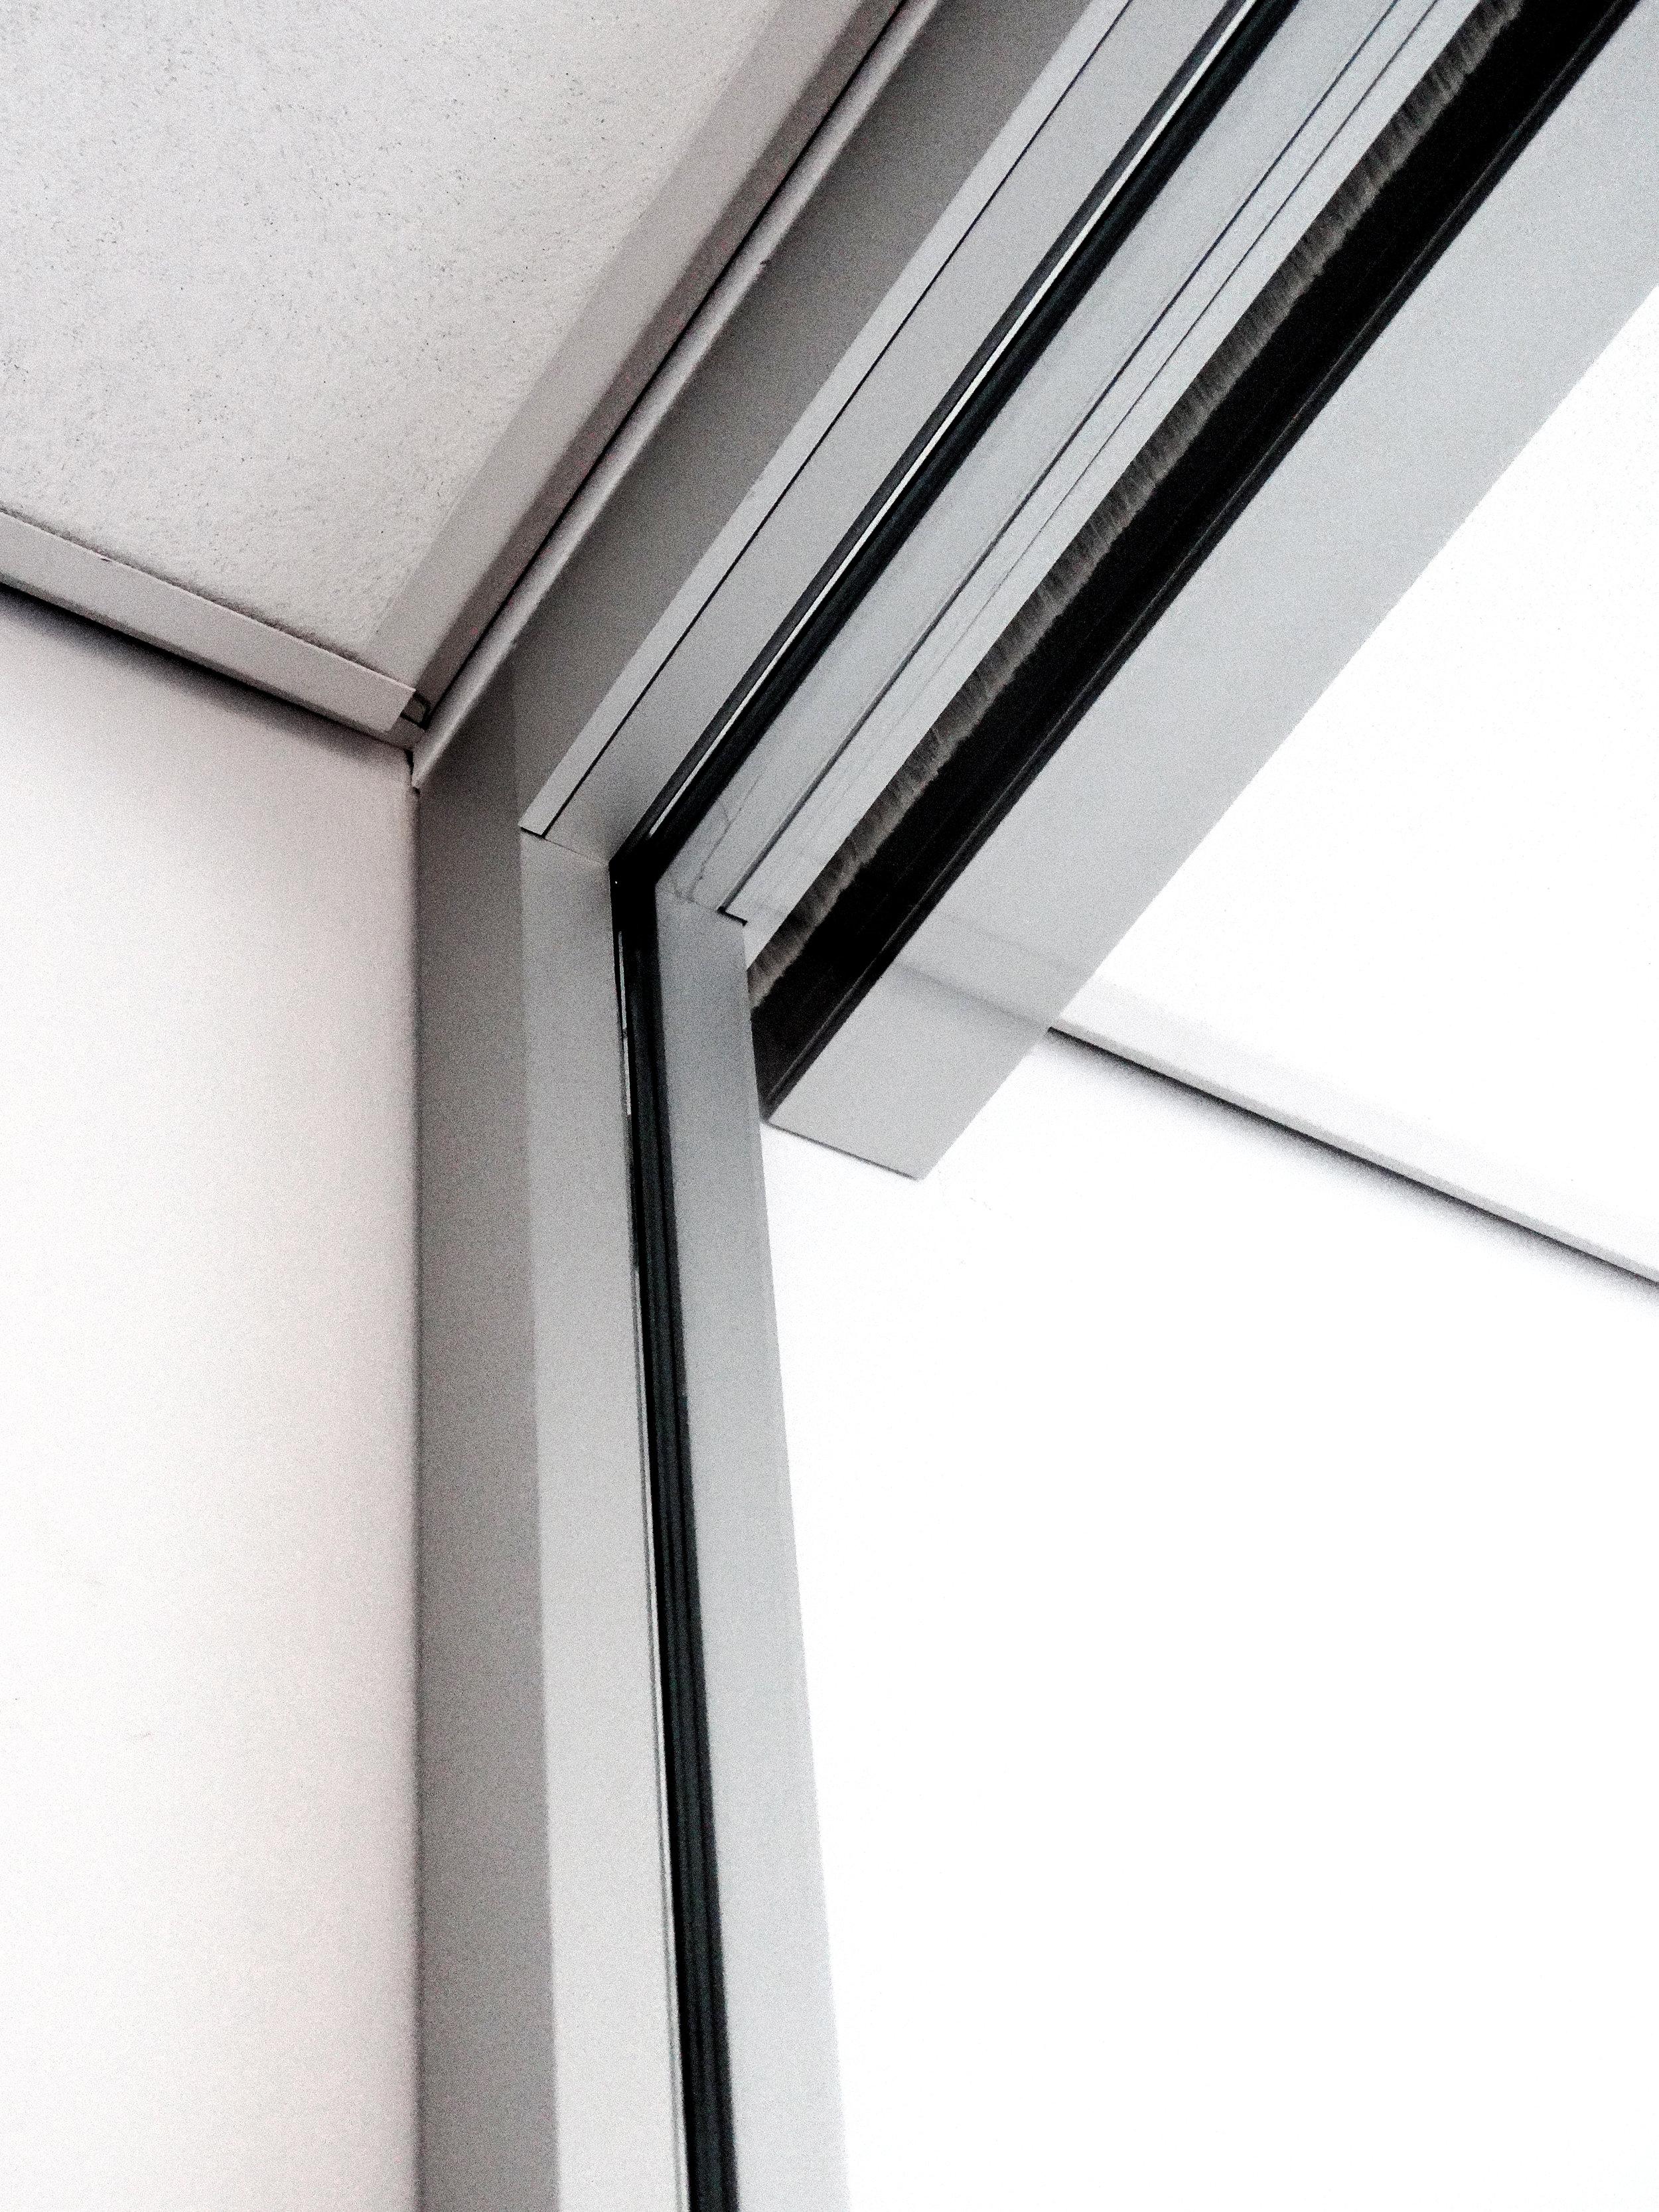 Litespace Sliding Glass Door Top Track Aluminum - Spaceworks AI.jpg